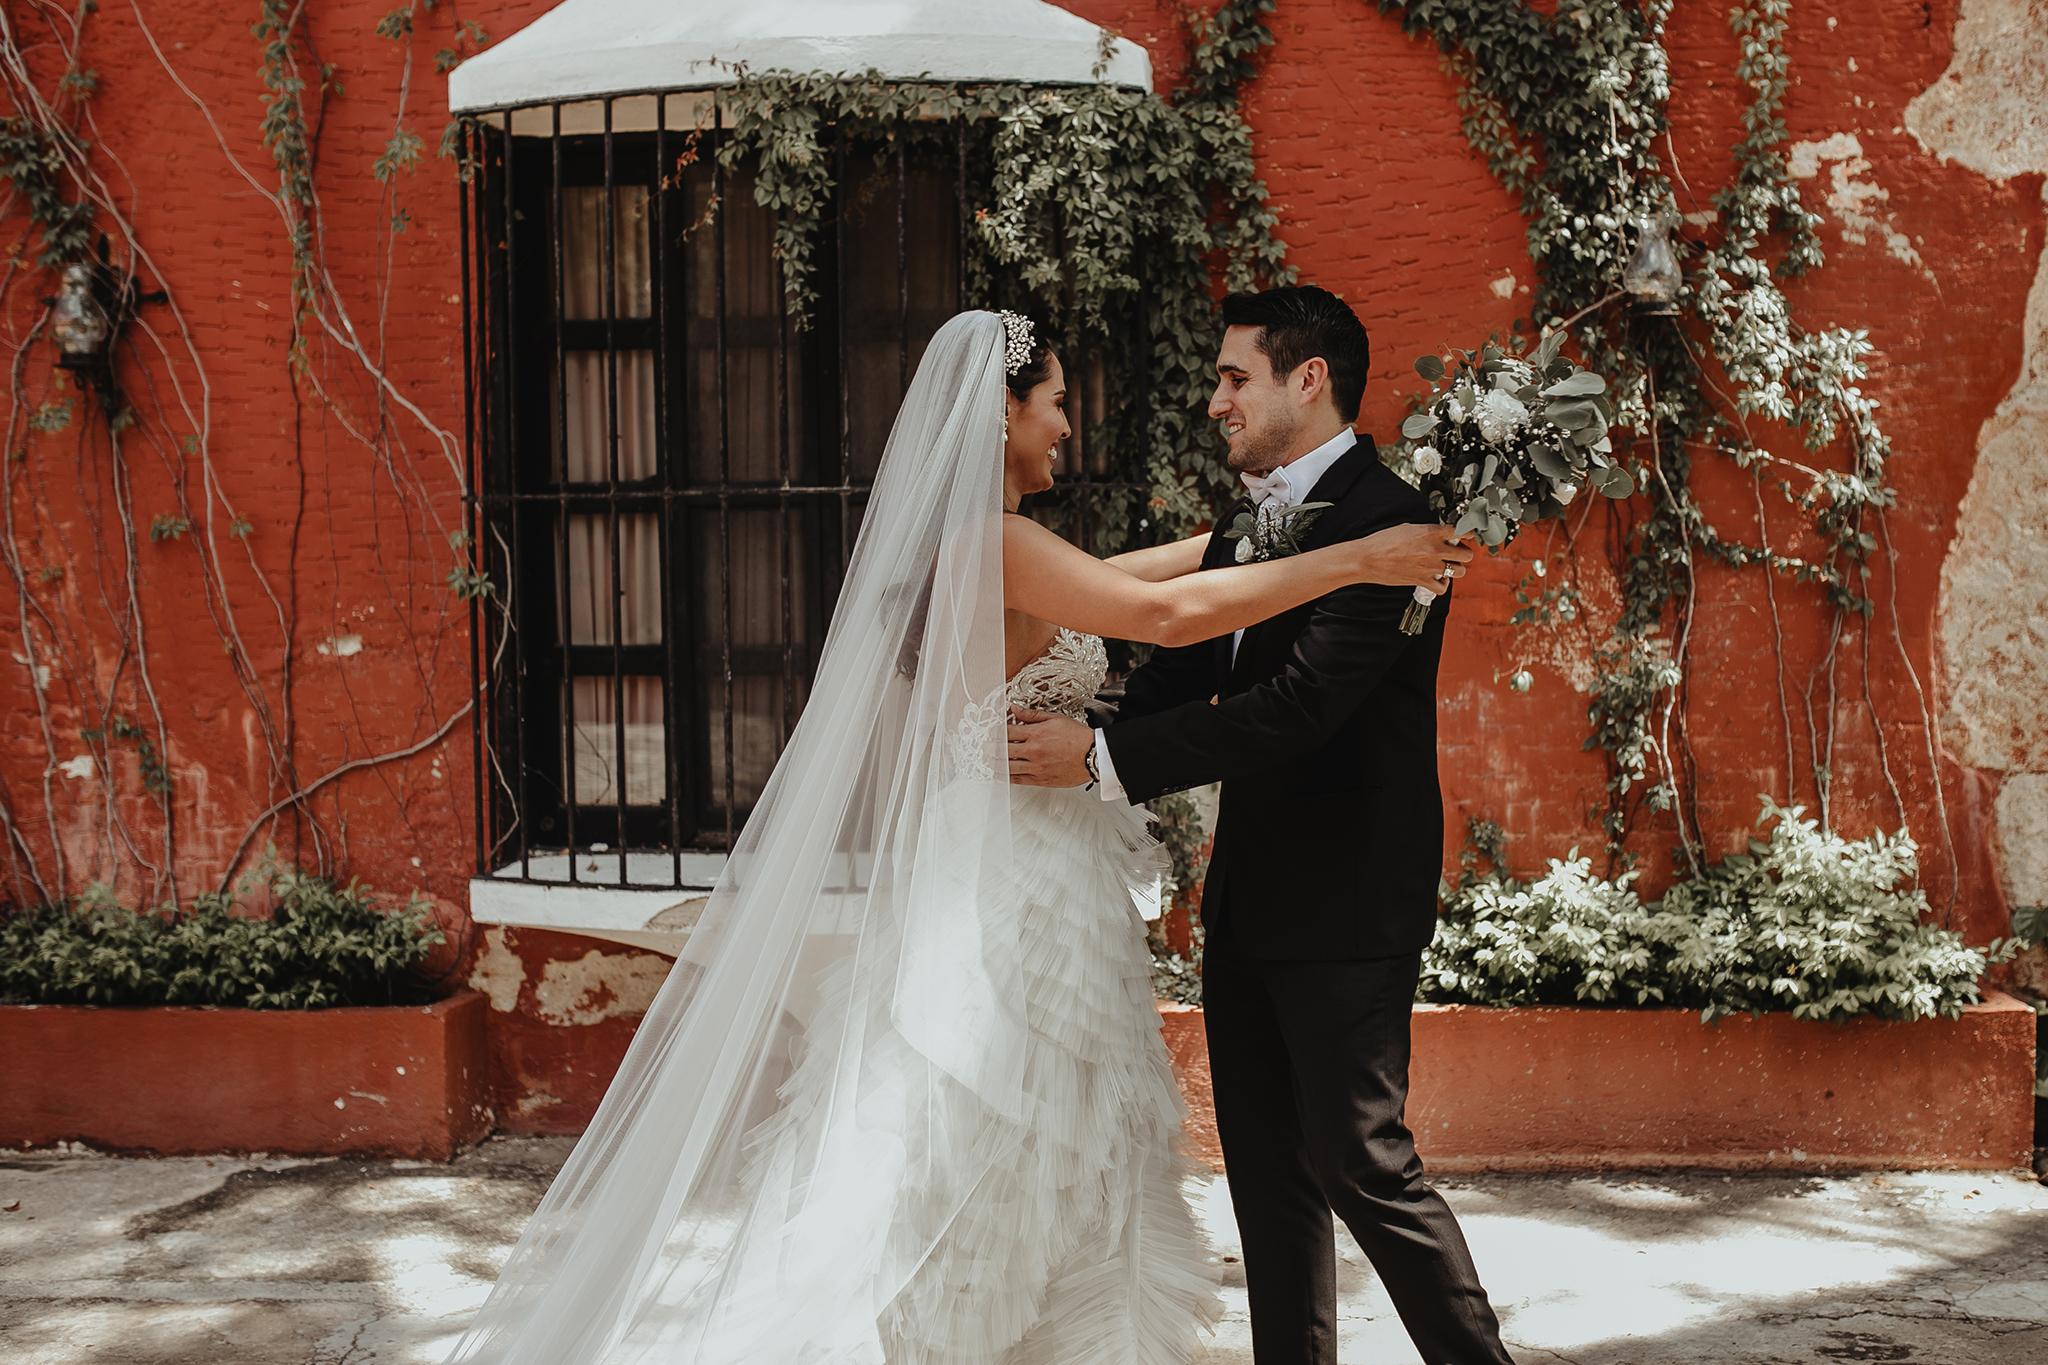 0290R&F__WeddingDestination_Weddingmerida_BodaMexico_FotografoDeBodas_FabrizioSimoneenFotografo.jpg